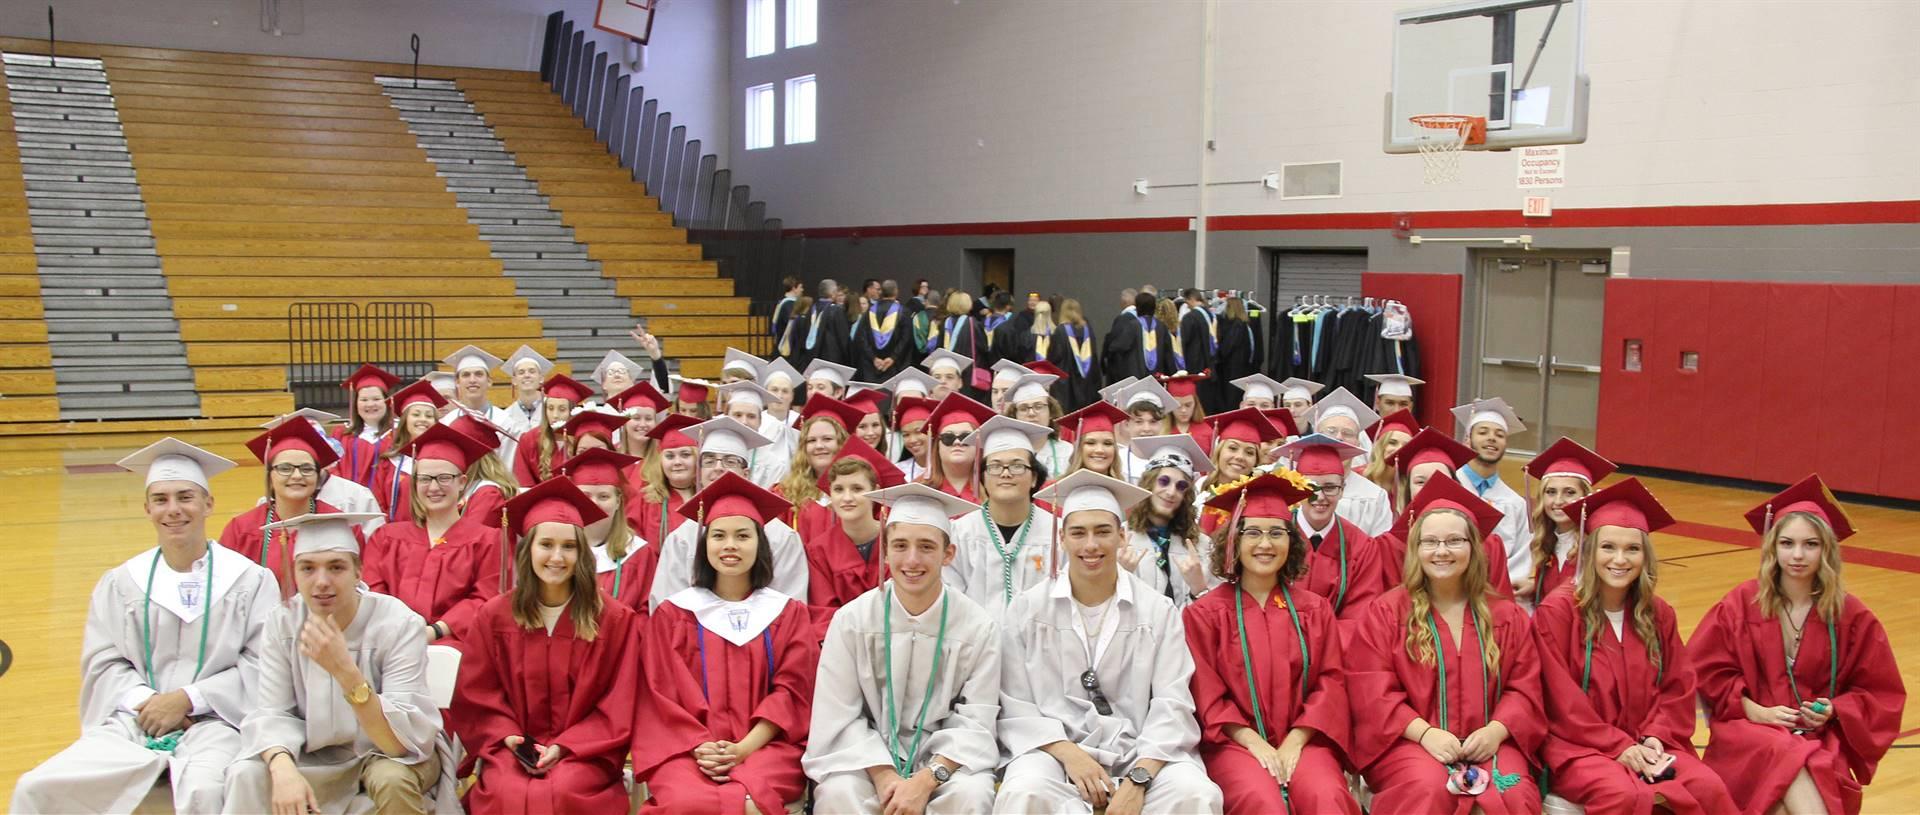 Graduation Ceremony 4